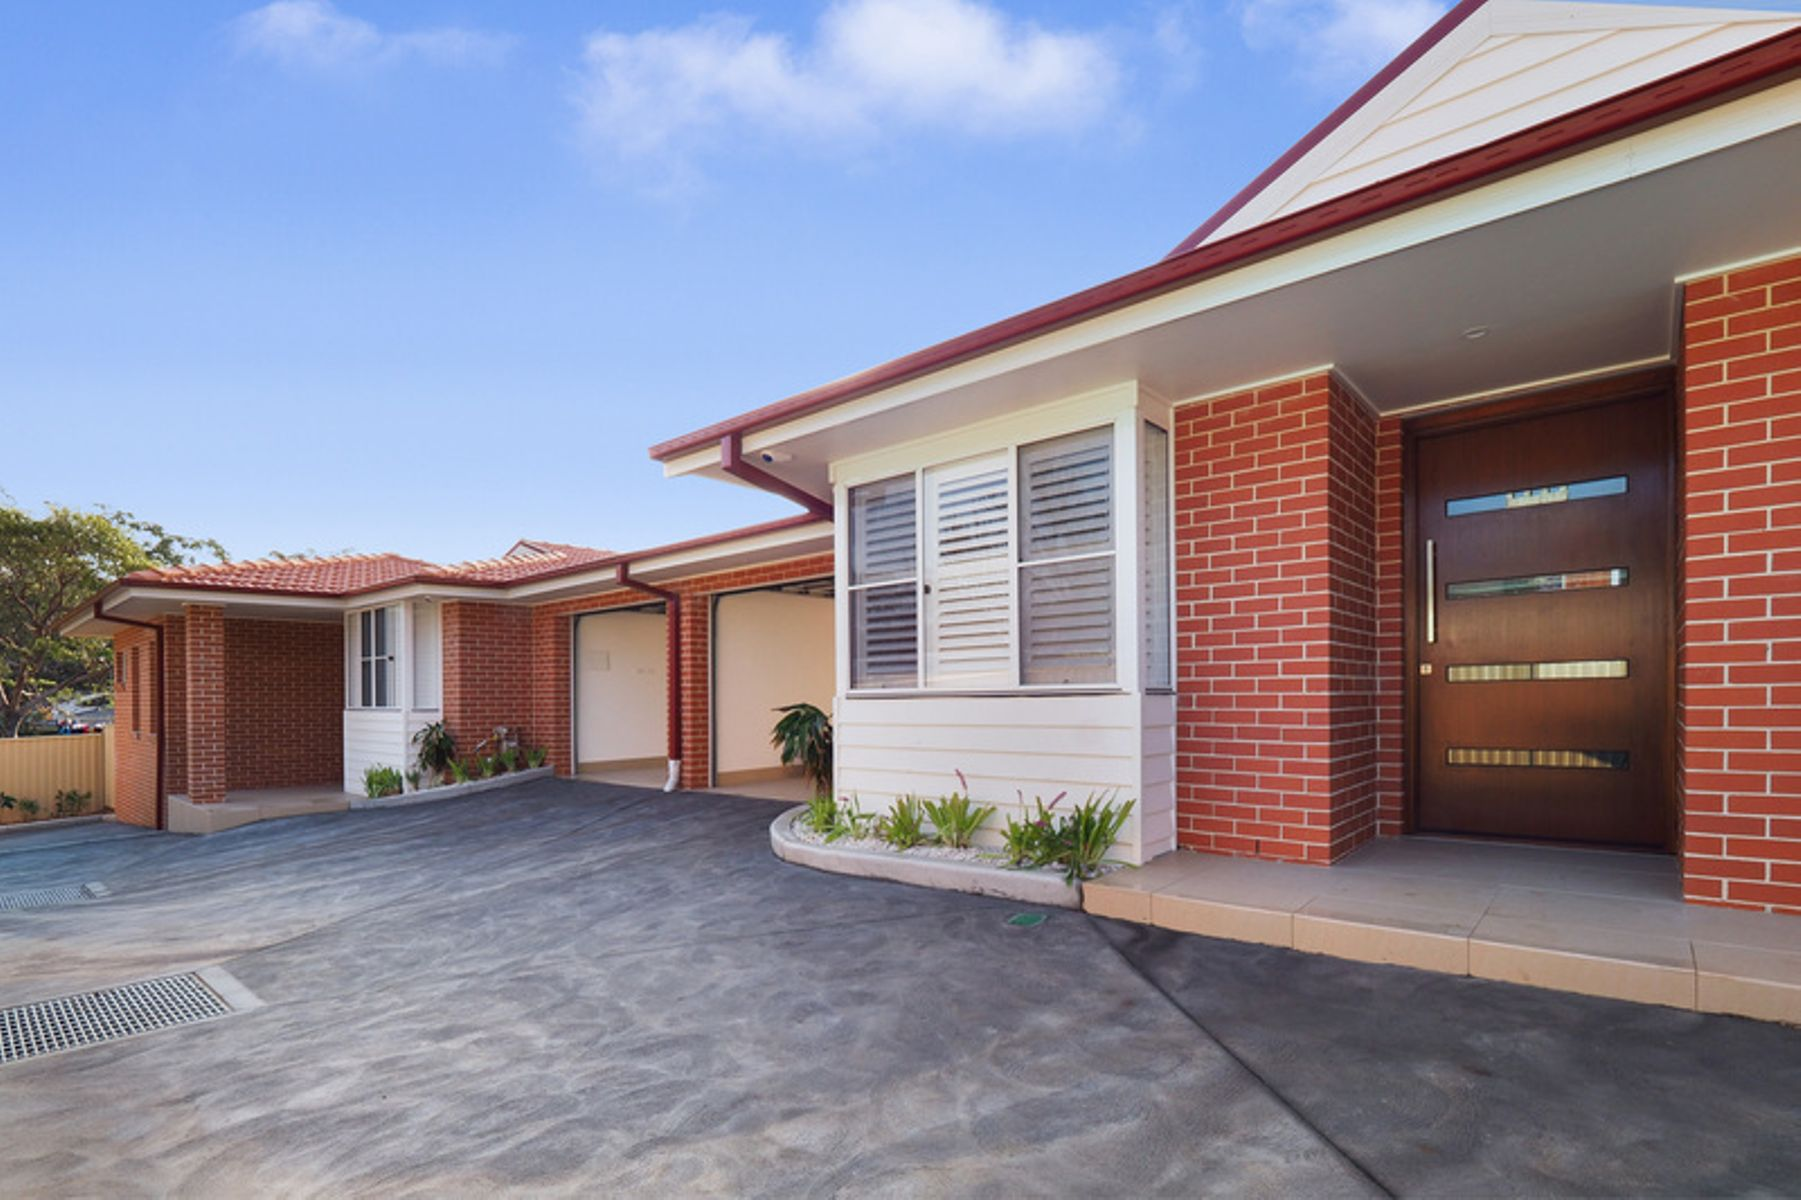 78B Anthony Road, Denistone, NSW 2114